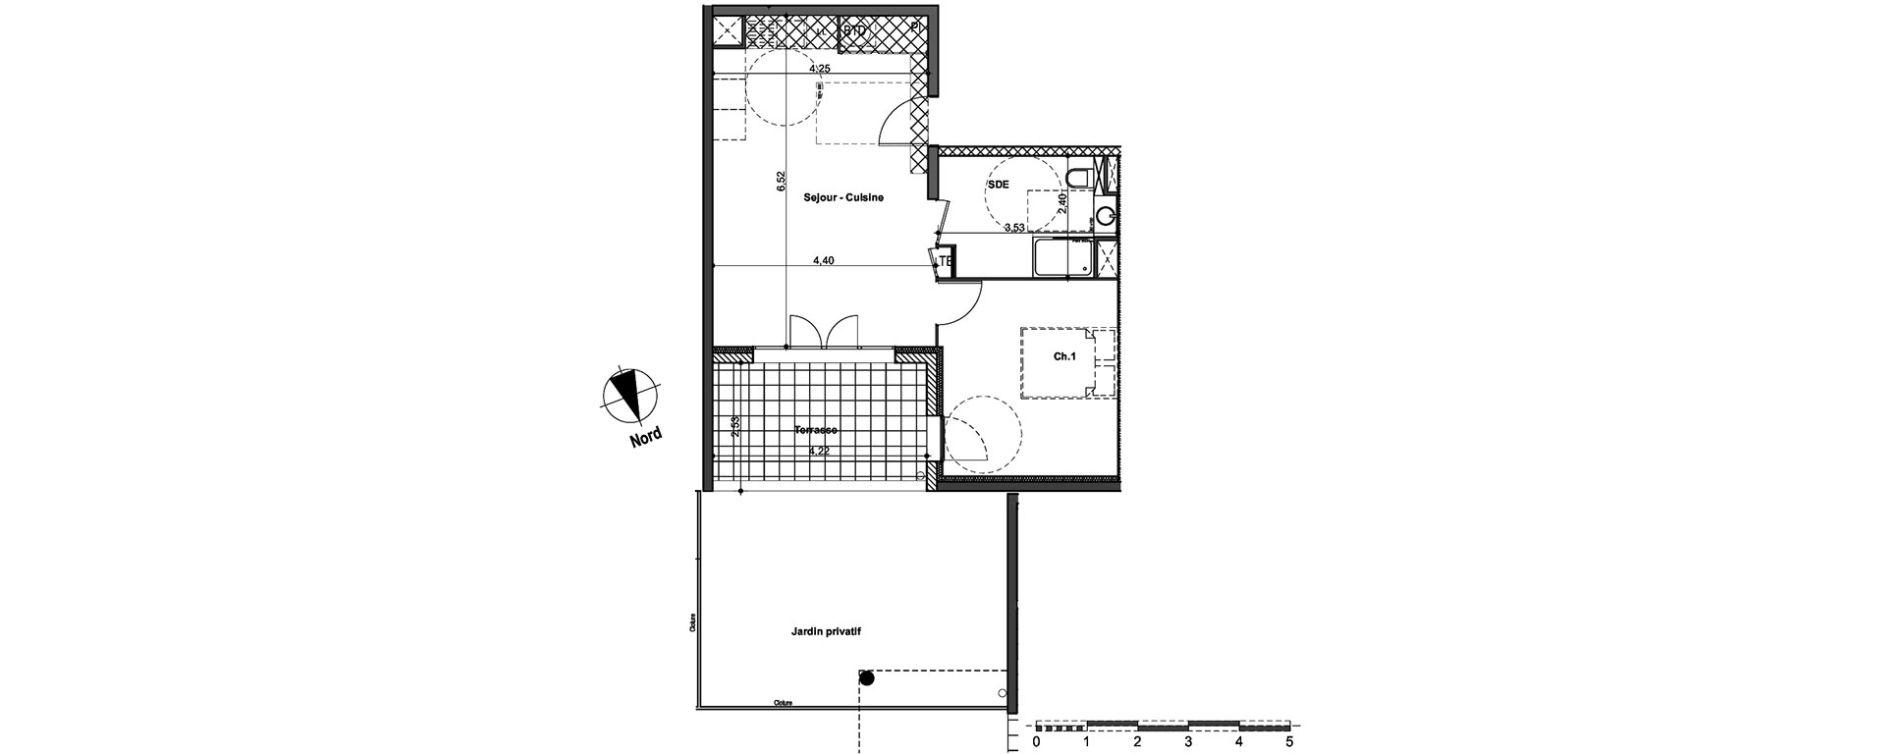 Appartement T2 de 48.75m2 RDC N Ekinox Aix-en-Provence ref 920